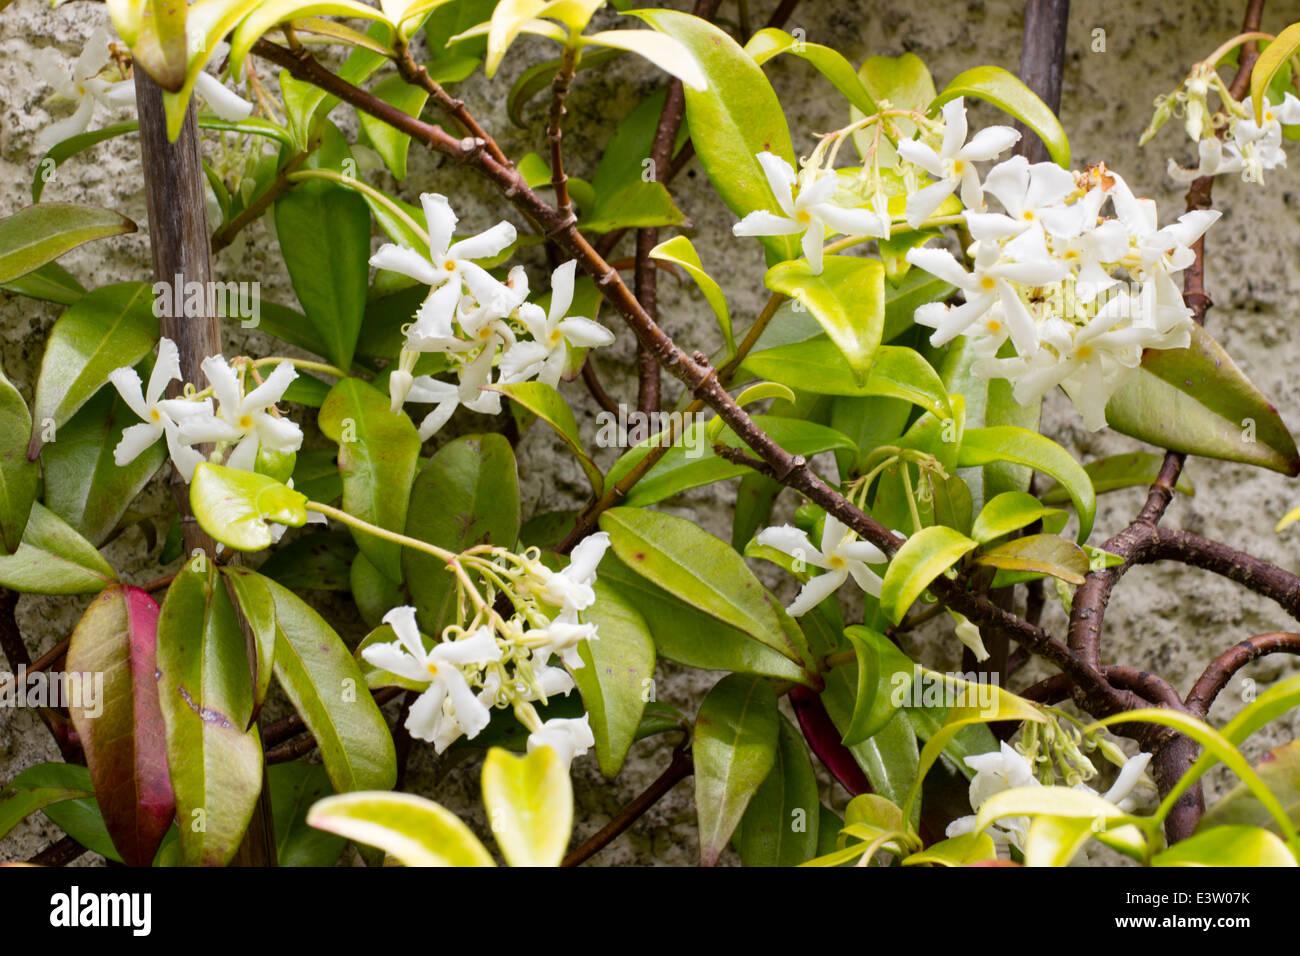 Foliage and flowers of the star jasmine, Trachelospermum jasminoides - Stock Image